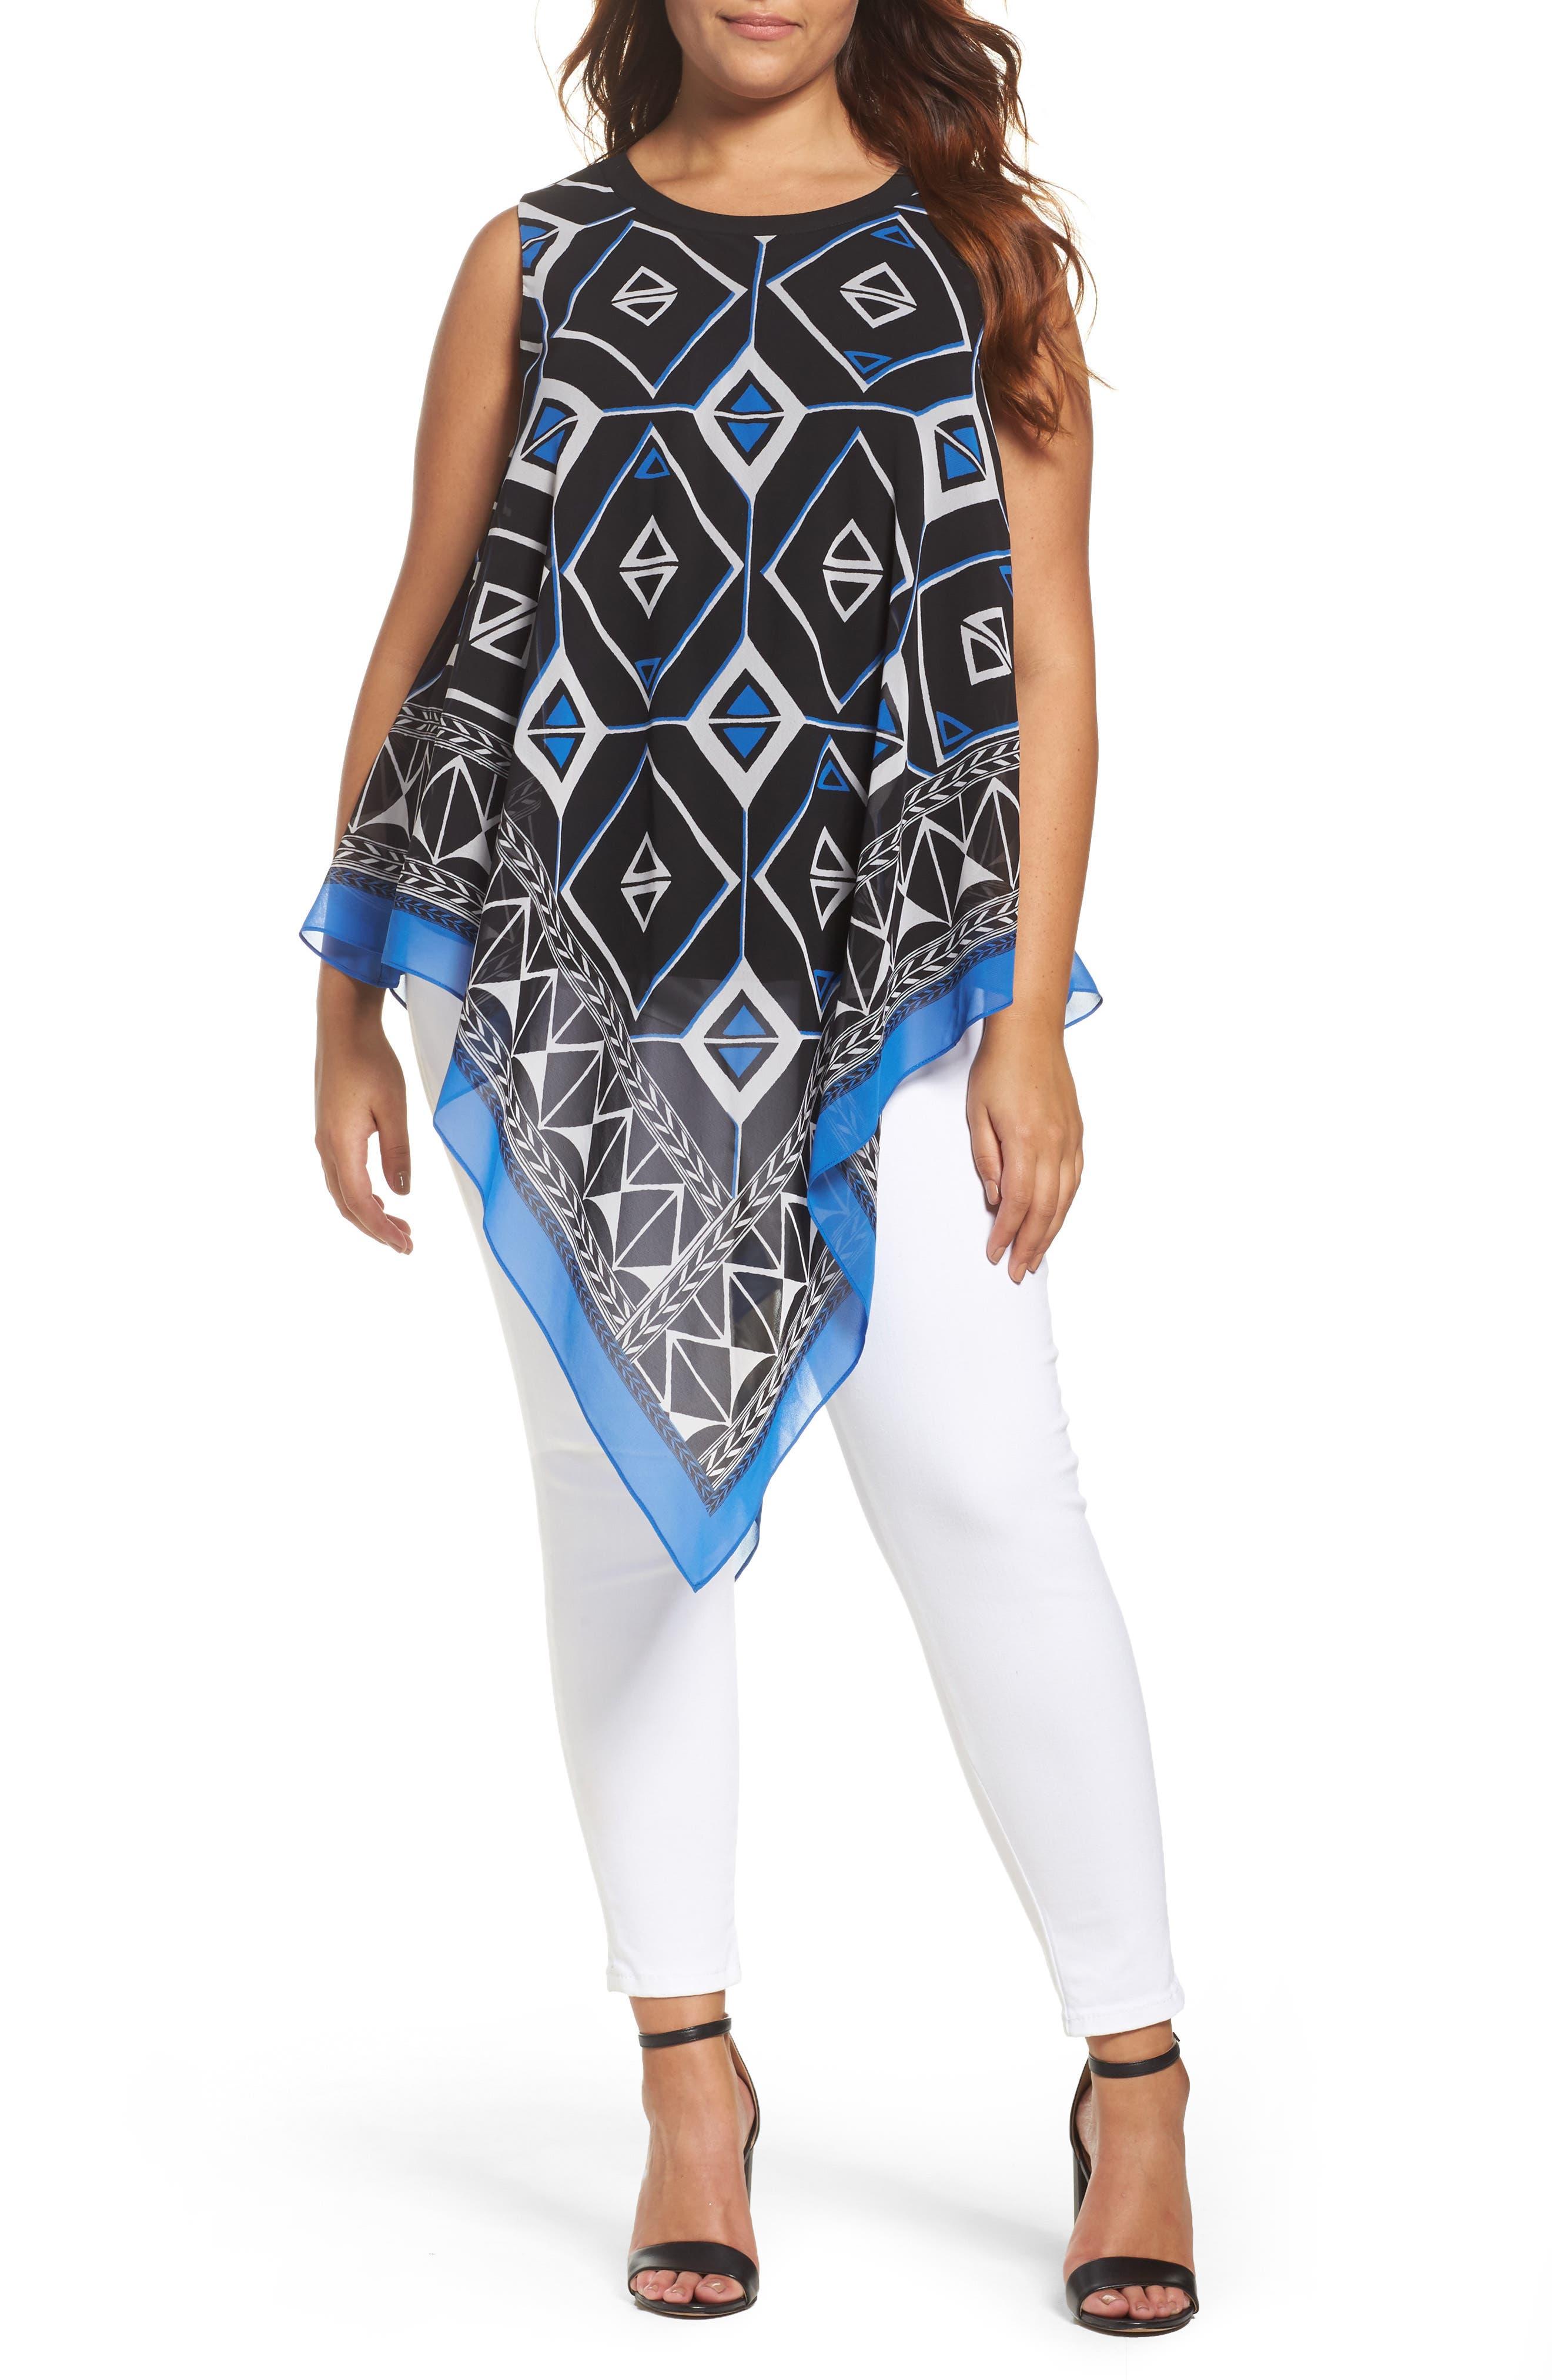 Vince Camuto Graphic Chiffon Handkerchief Blouse (Plus Size)